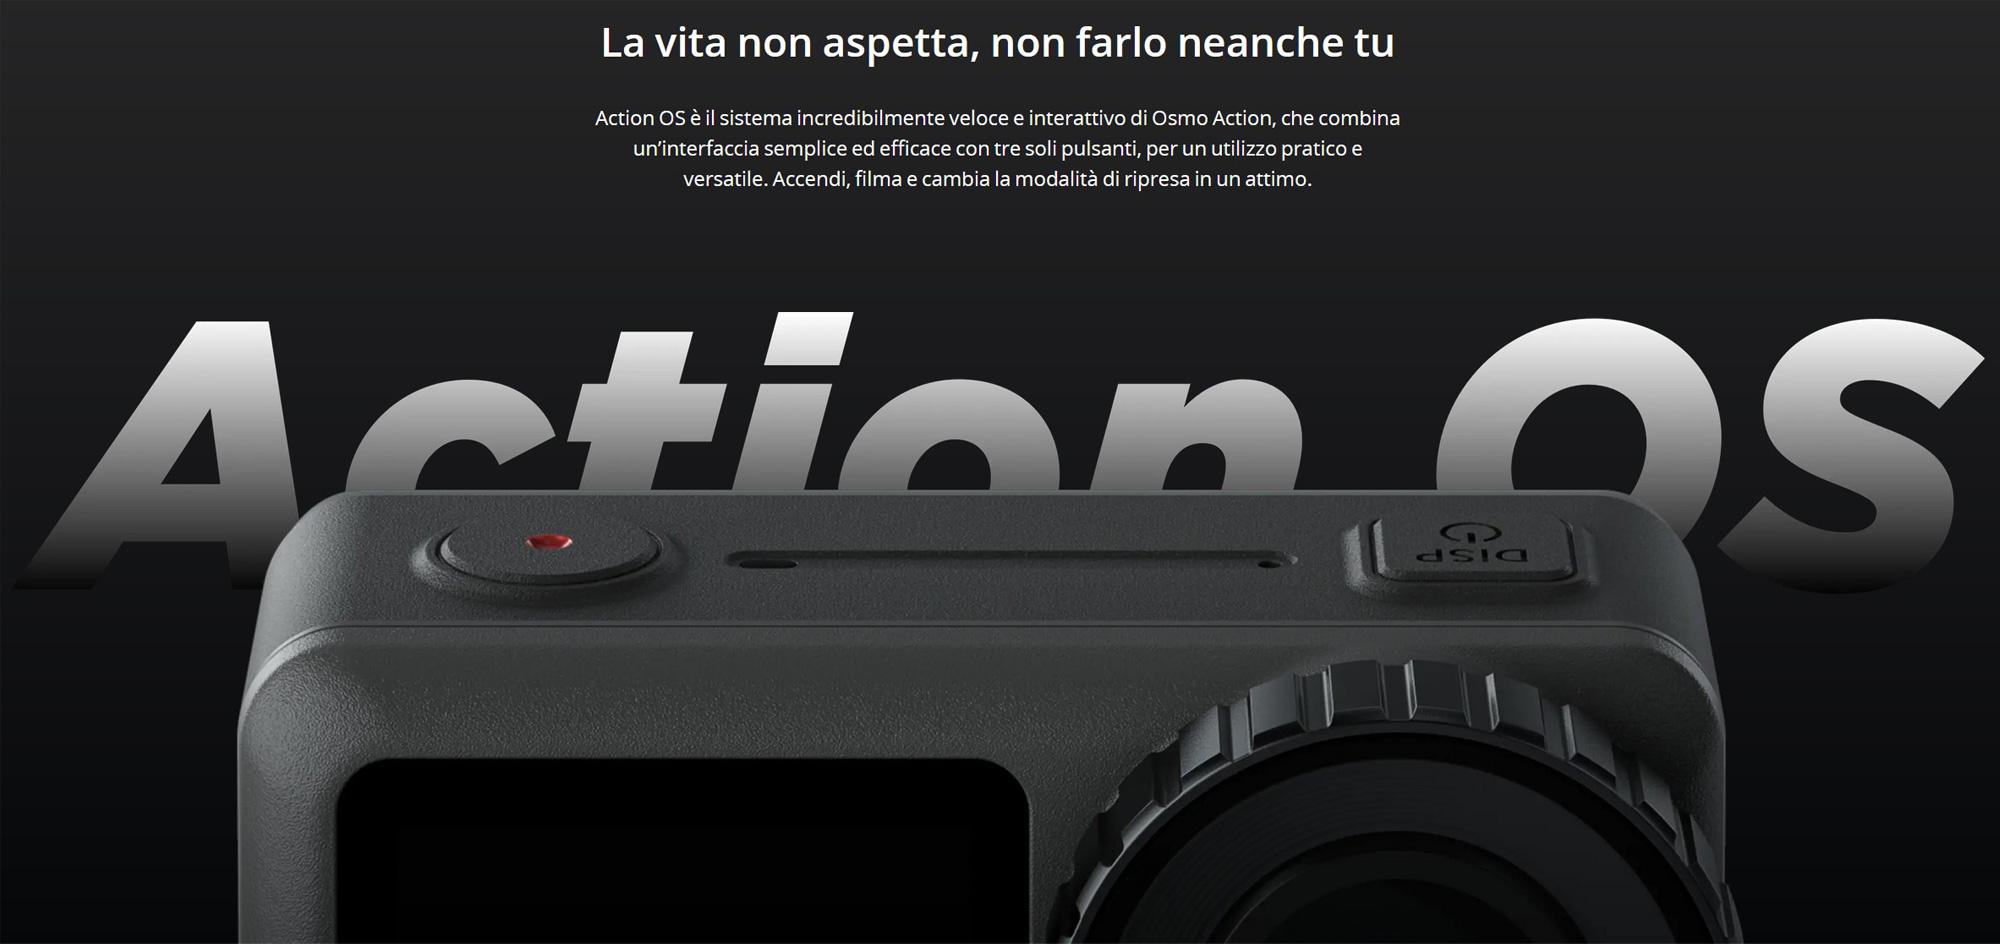 dji-osmo-action-camera_14.jpg